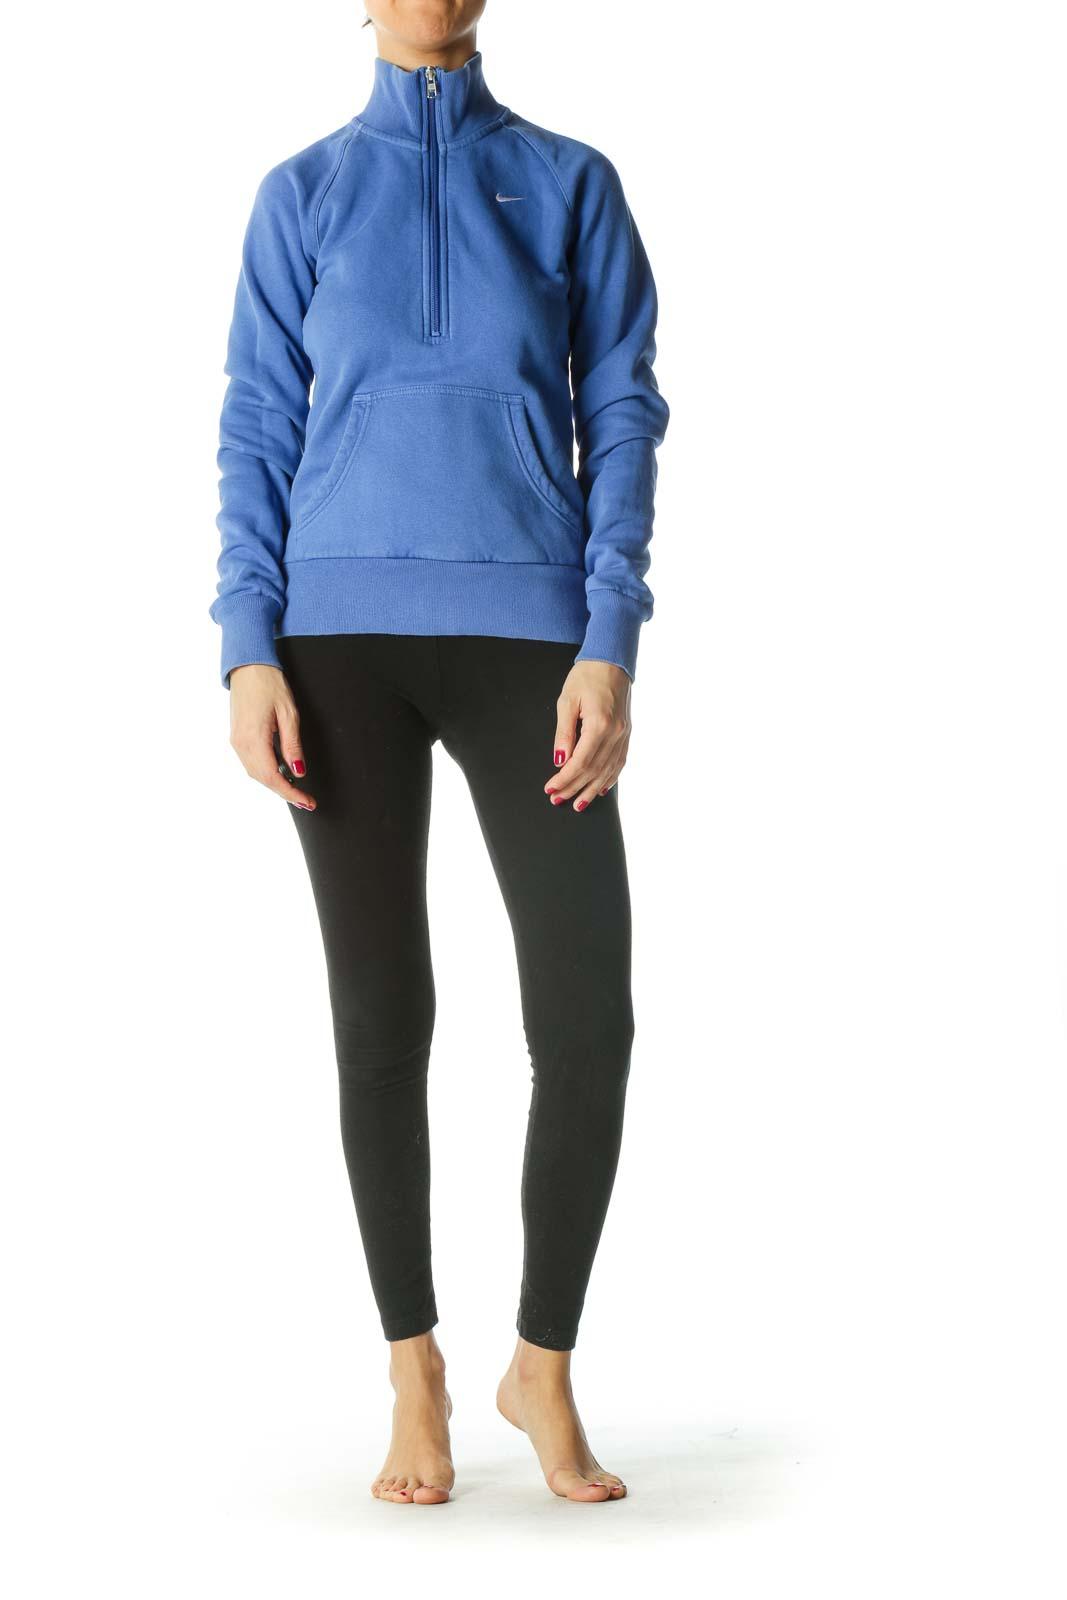 Blue Pocketed Zippered High-Neck Active Jacket